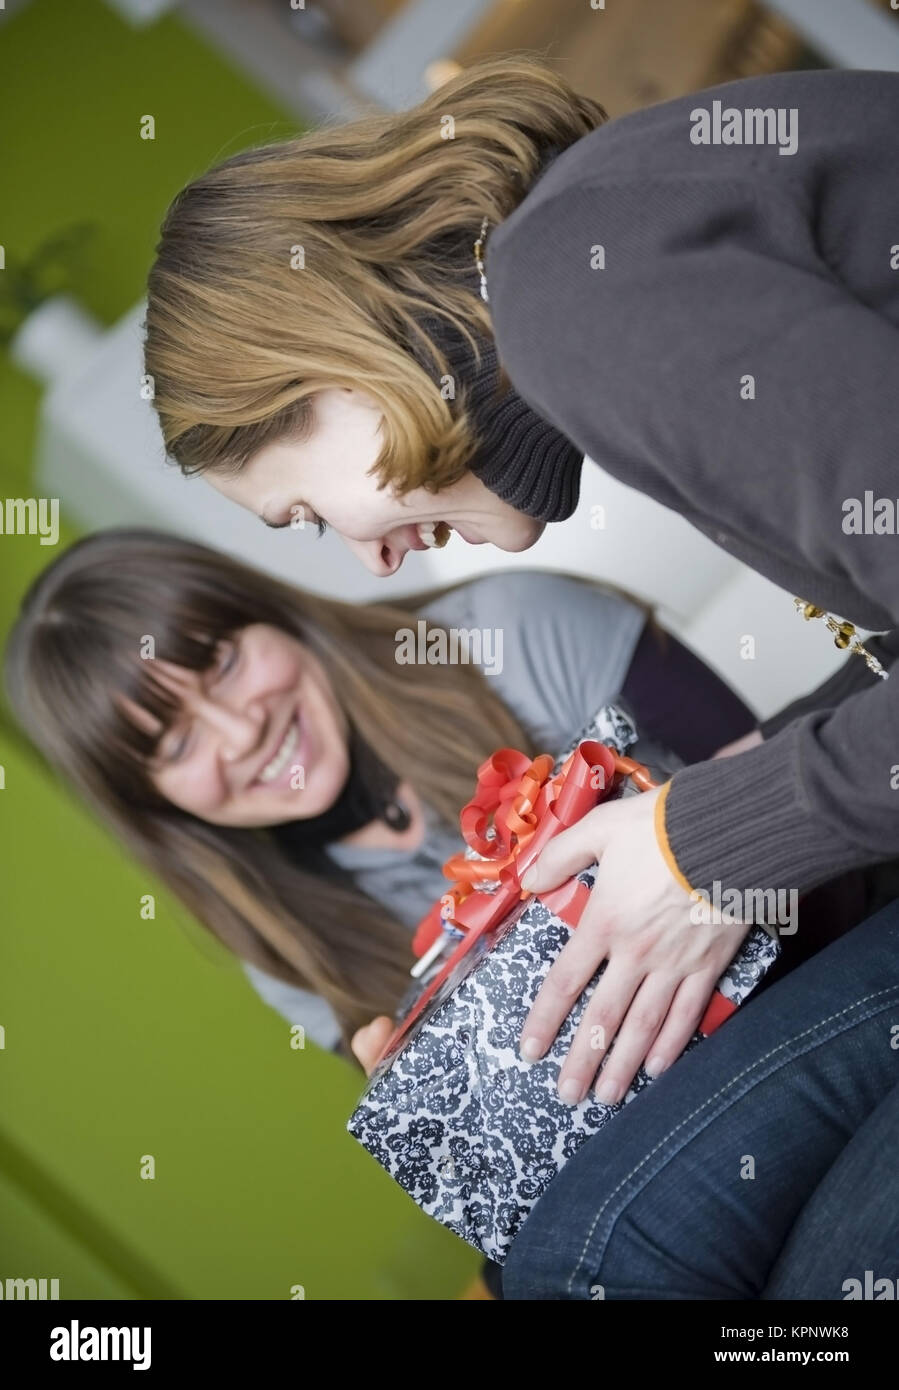 Model release , Zwei Freundinnen beim Geschenk auspacken - girl friends with present Stock Photo